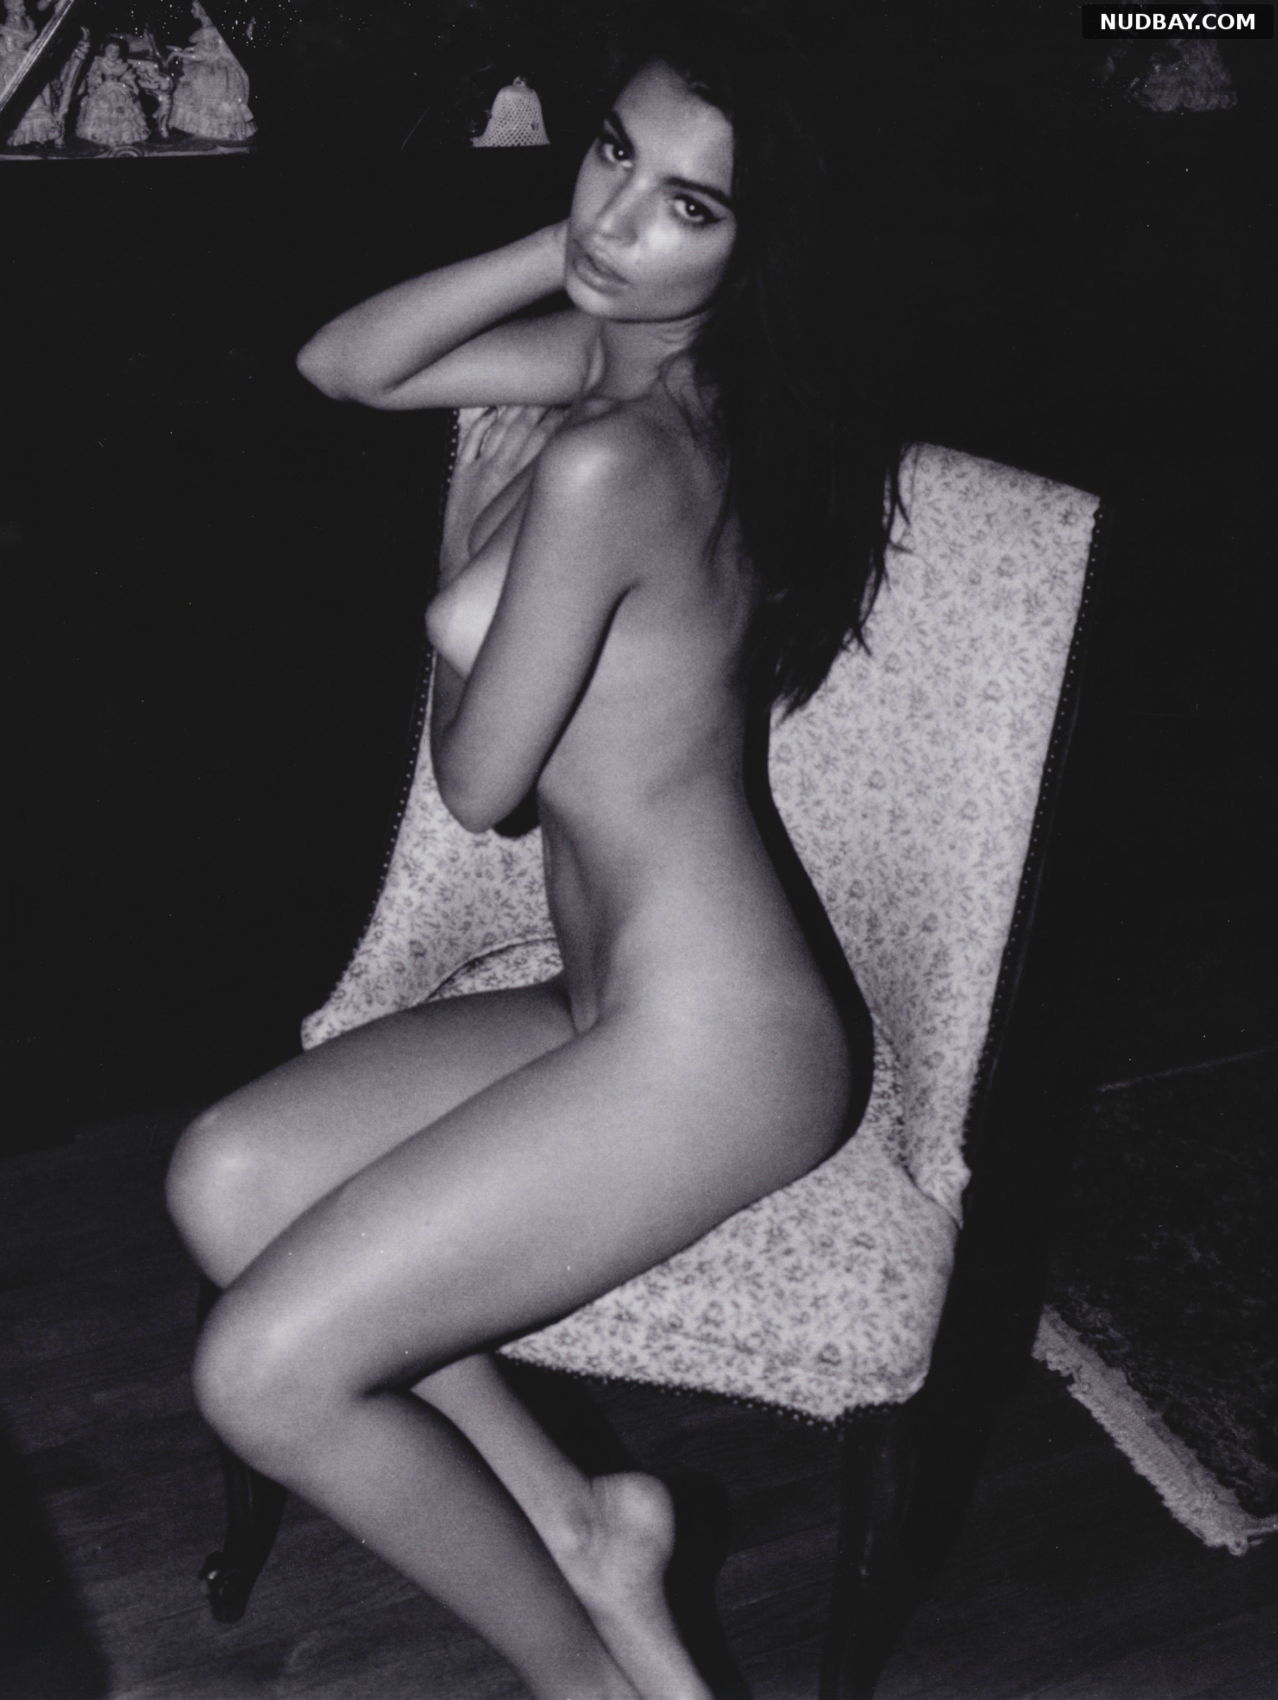 Emily Ratajkowski Nude Horny Nipples For Photoshoot